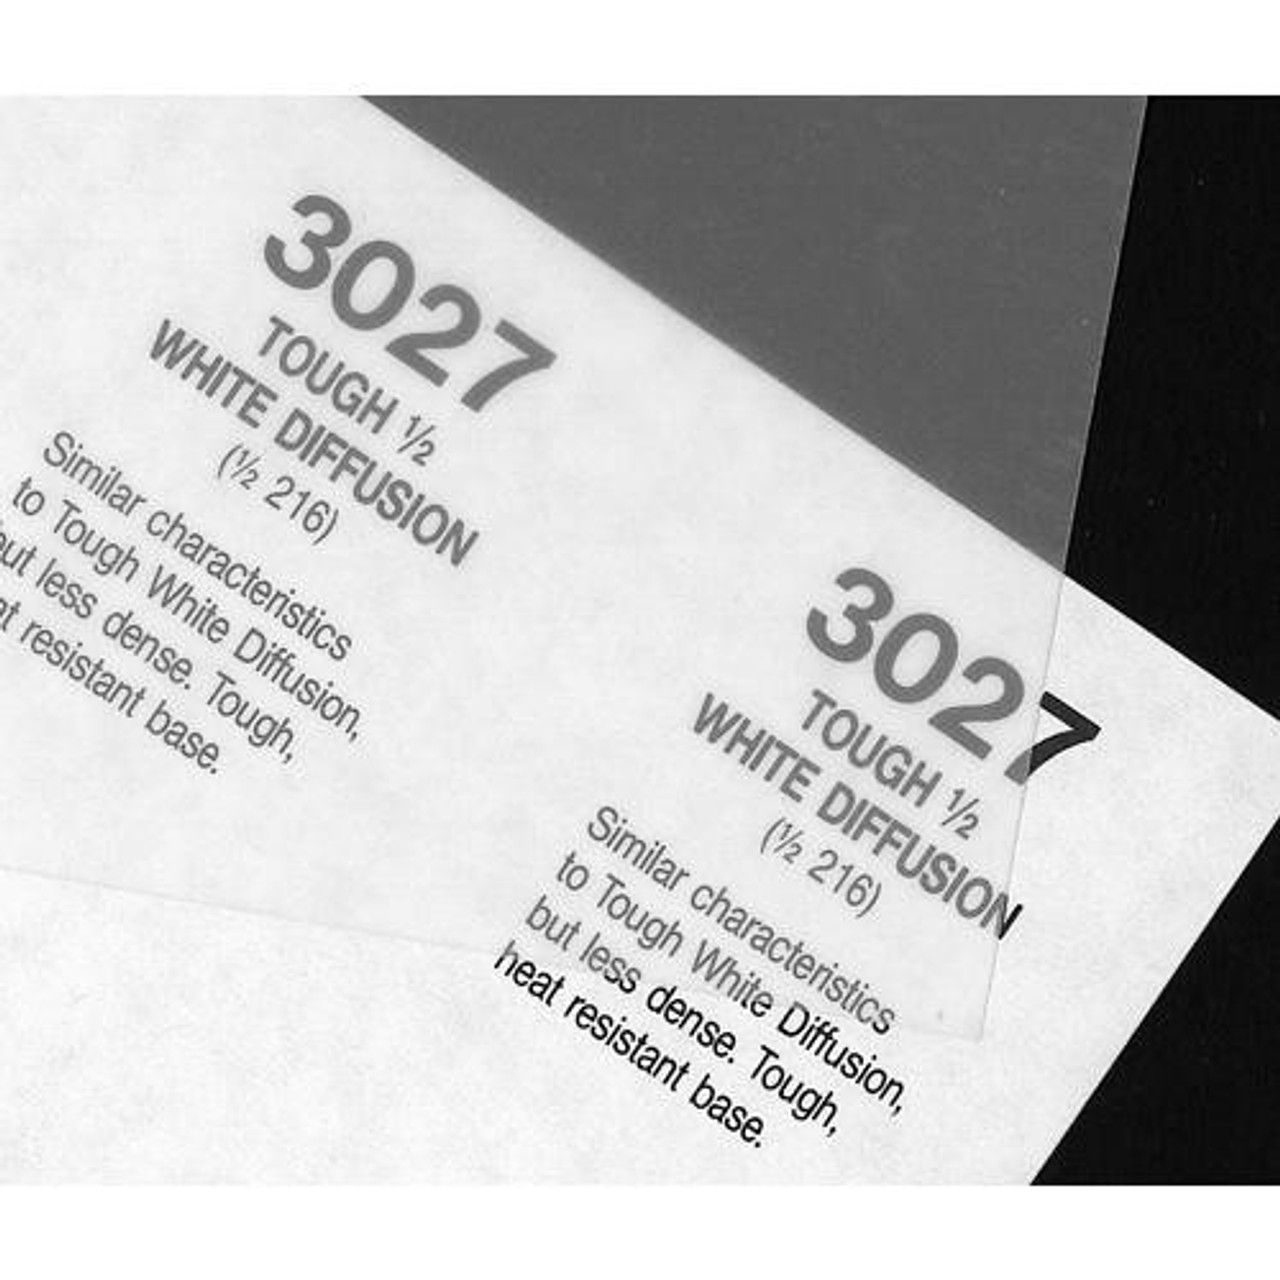 "#3027 Rosco Cinegel 1/2 Tough White Diffusion, 20x24"", Gels"